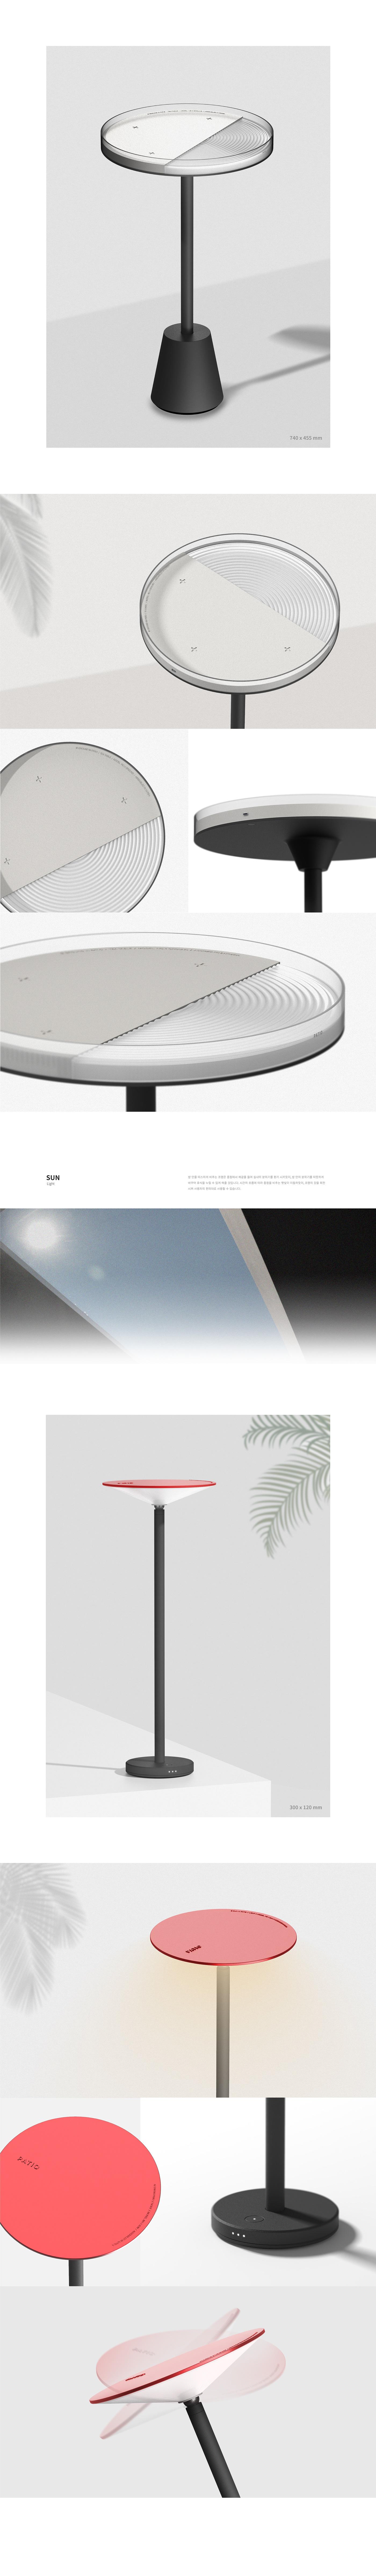 Image may contain: screenshot, minimalist and abstract